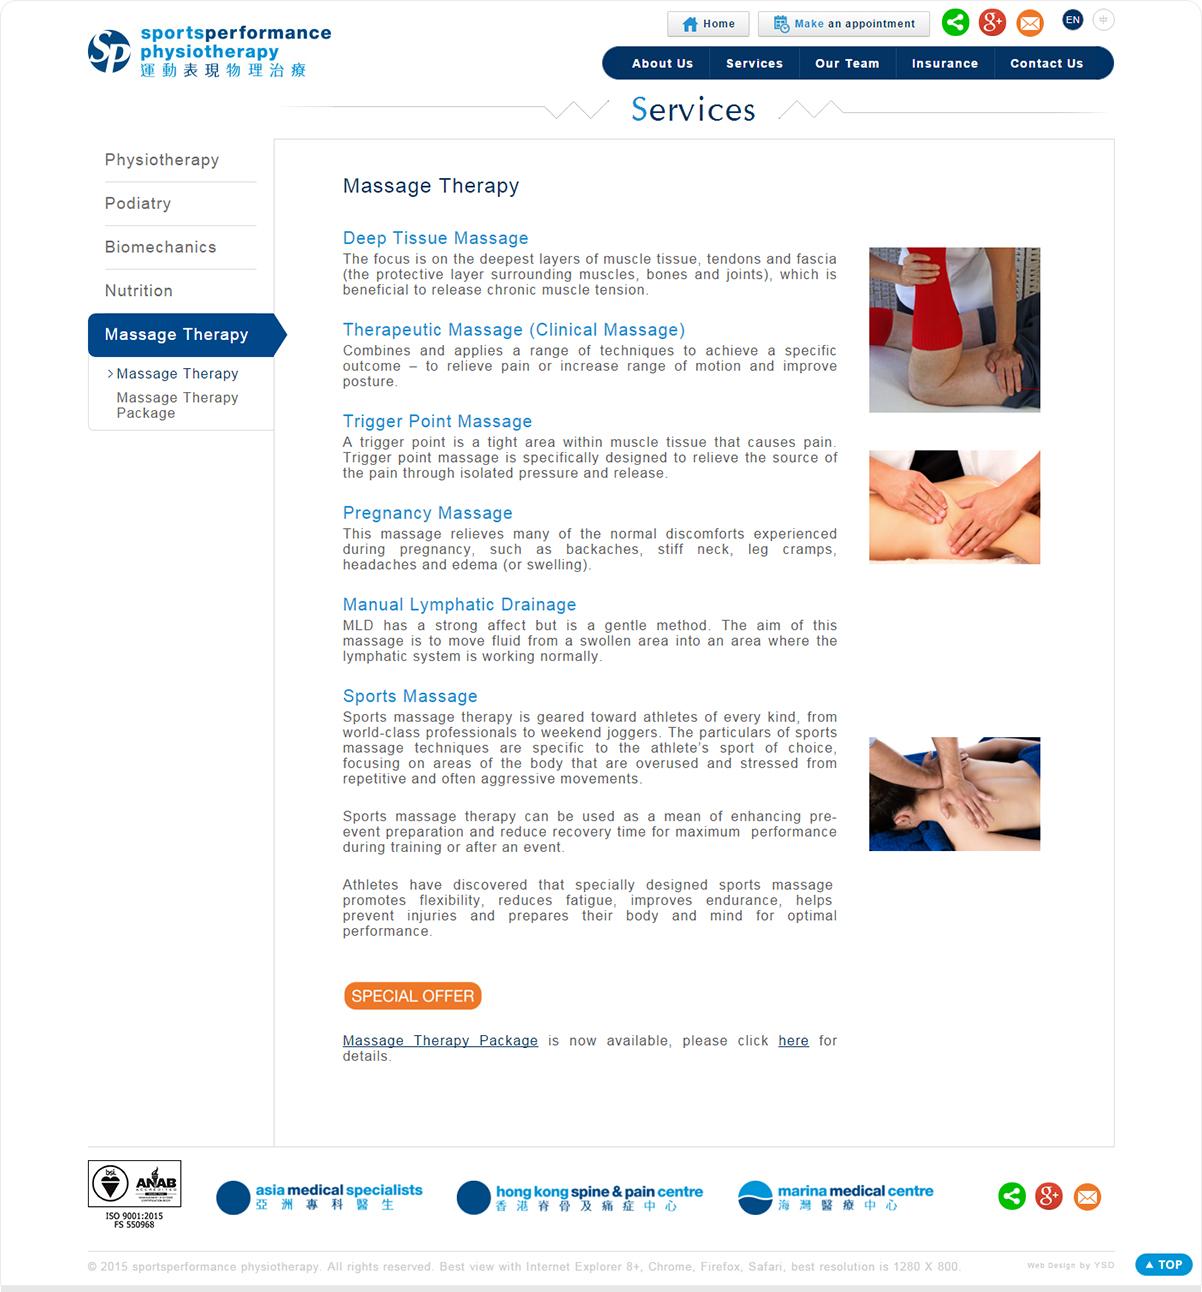 sportsperformance physiotherapy